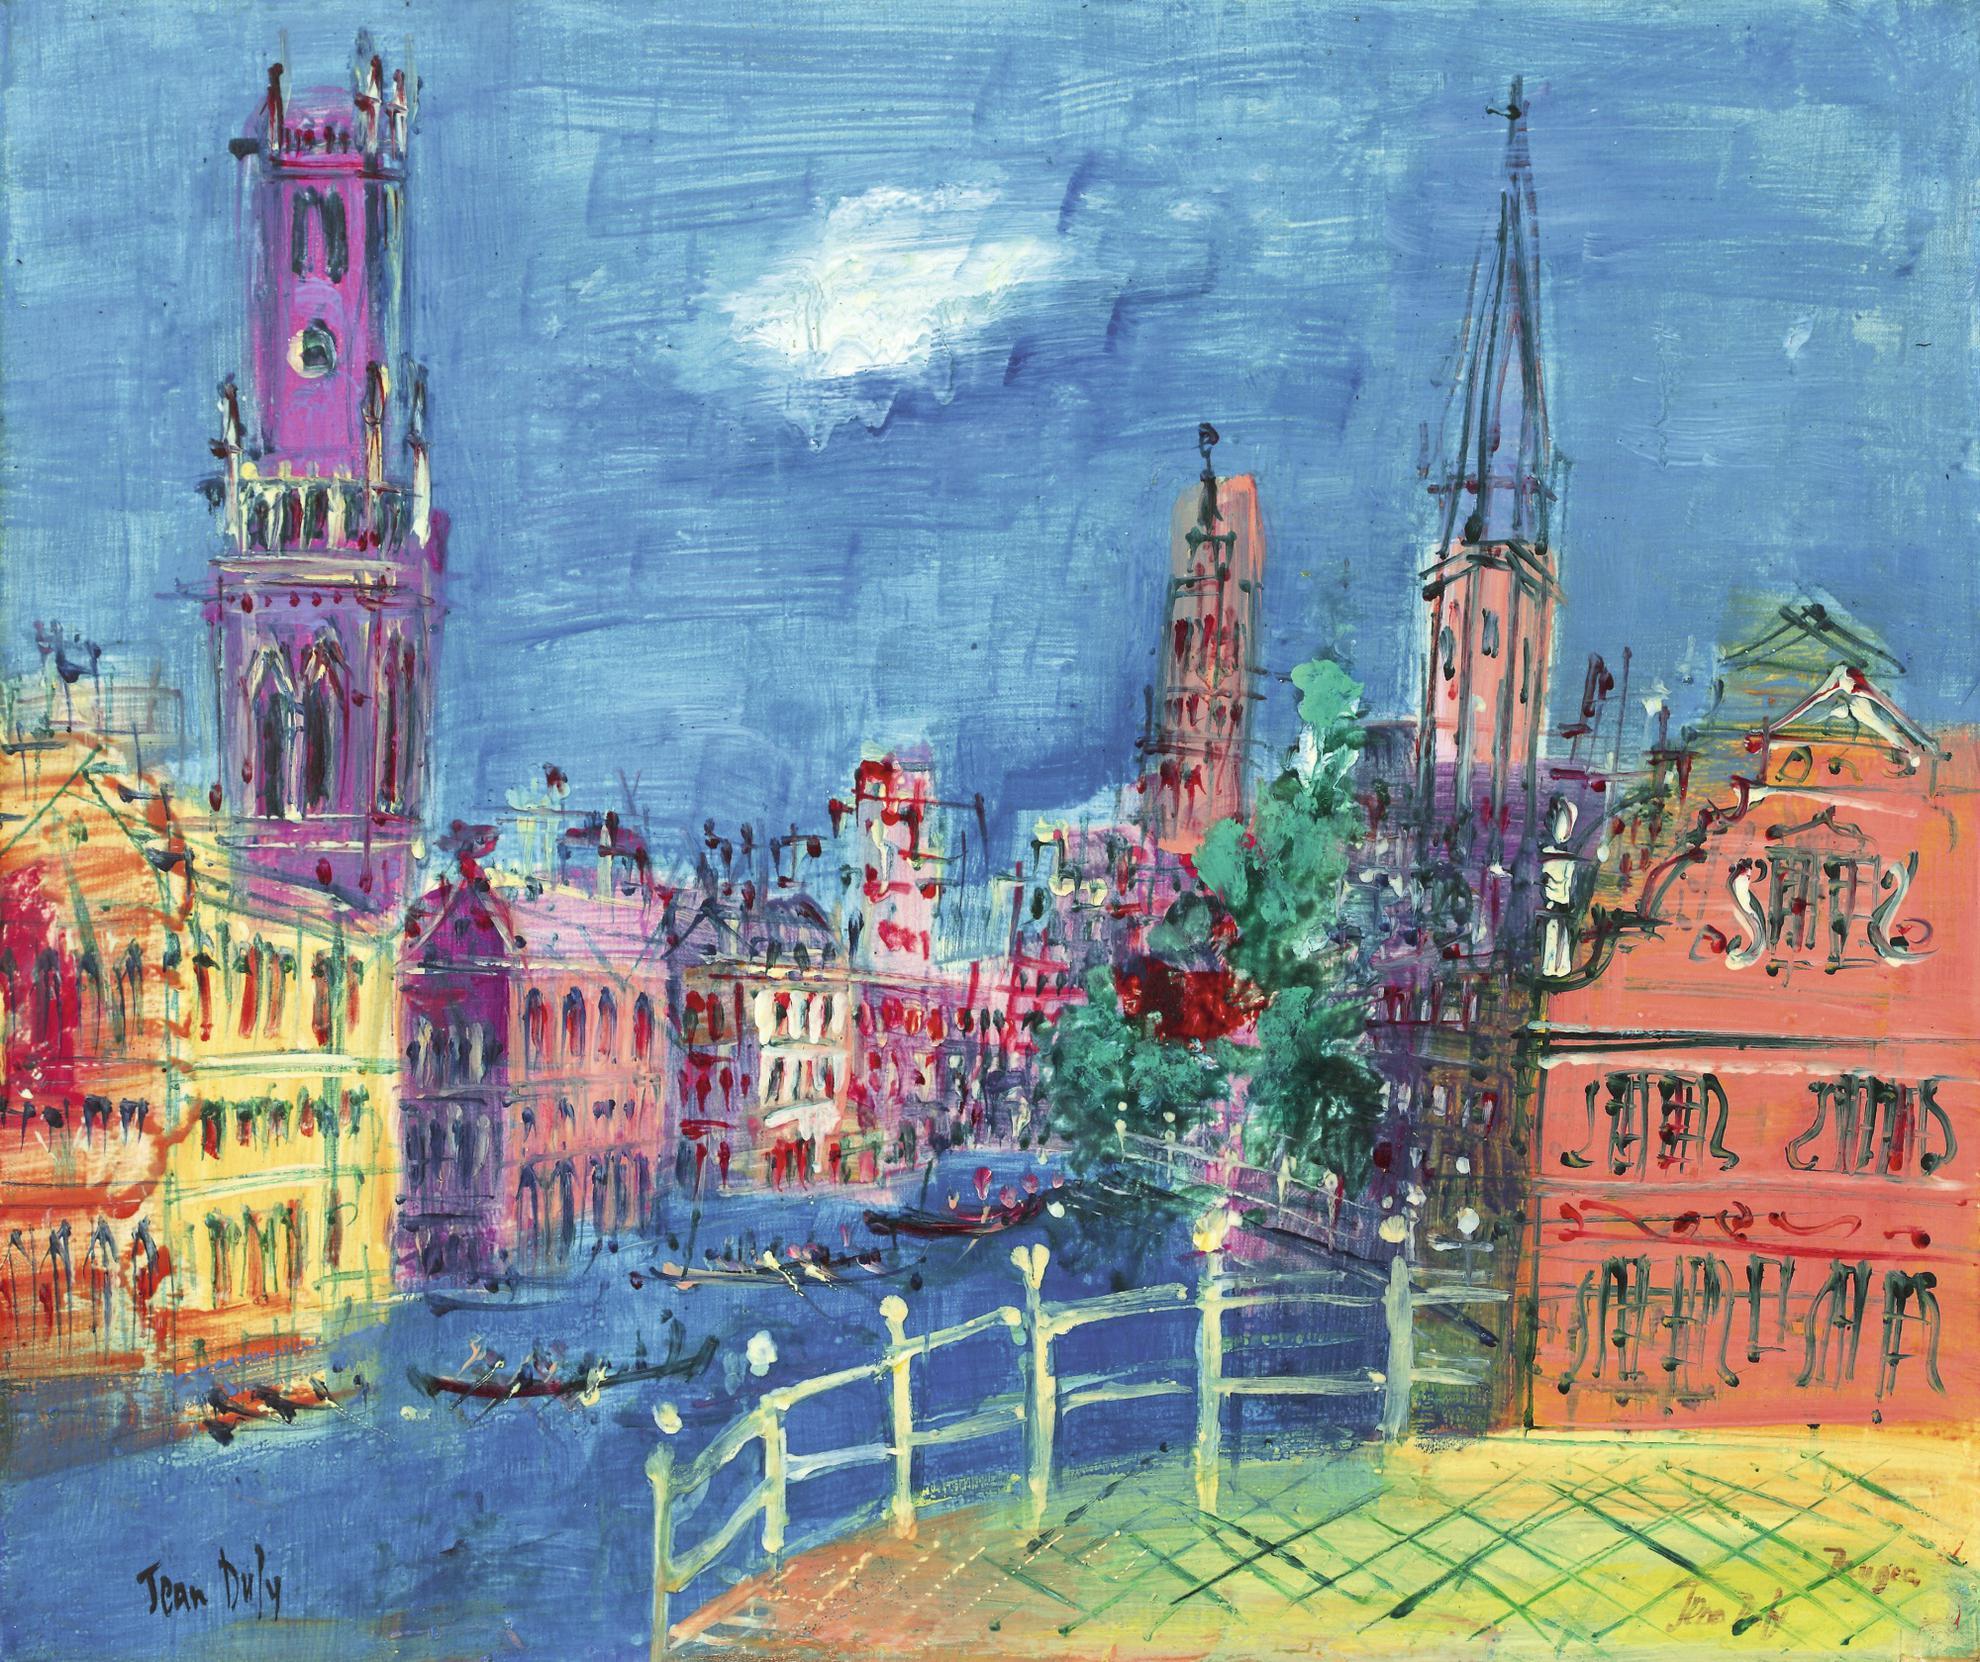 Jean Dufy-Bruges-1950